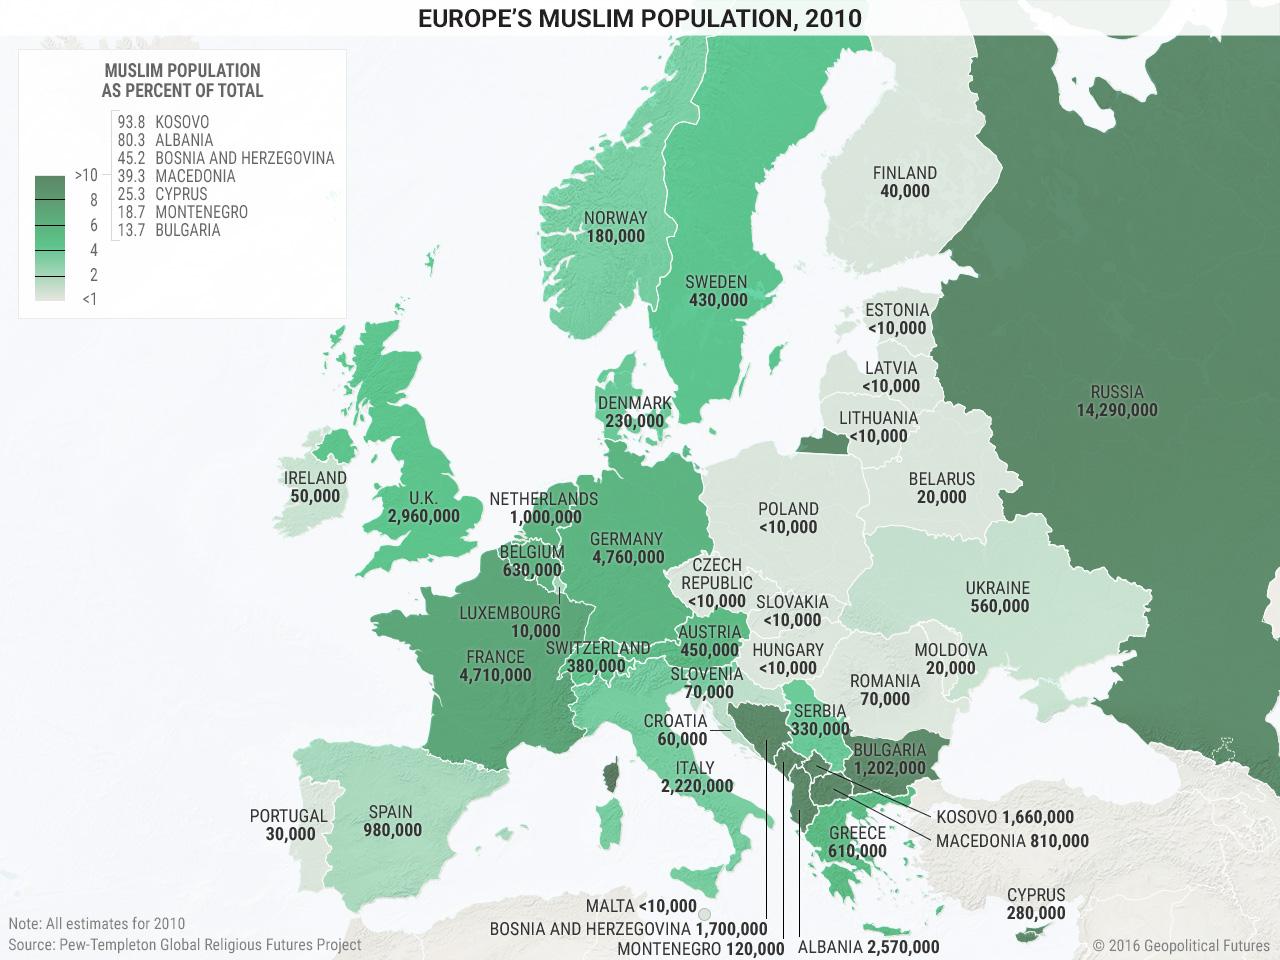 Europe's Muslim Population, 2010